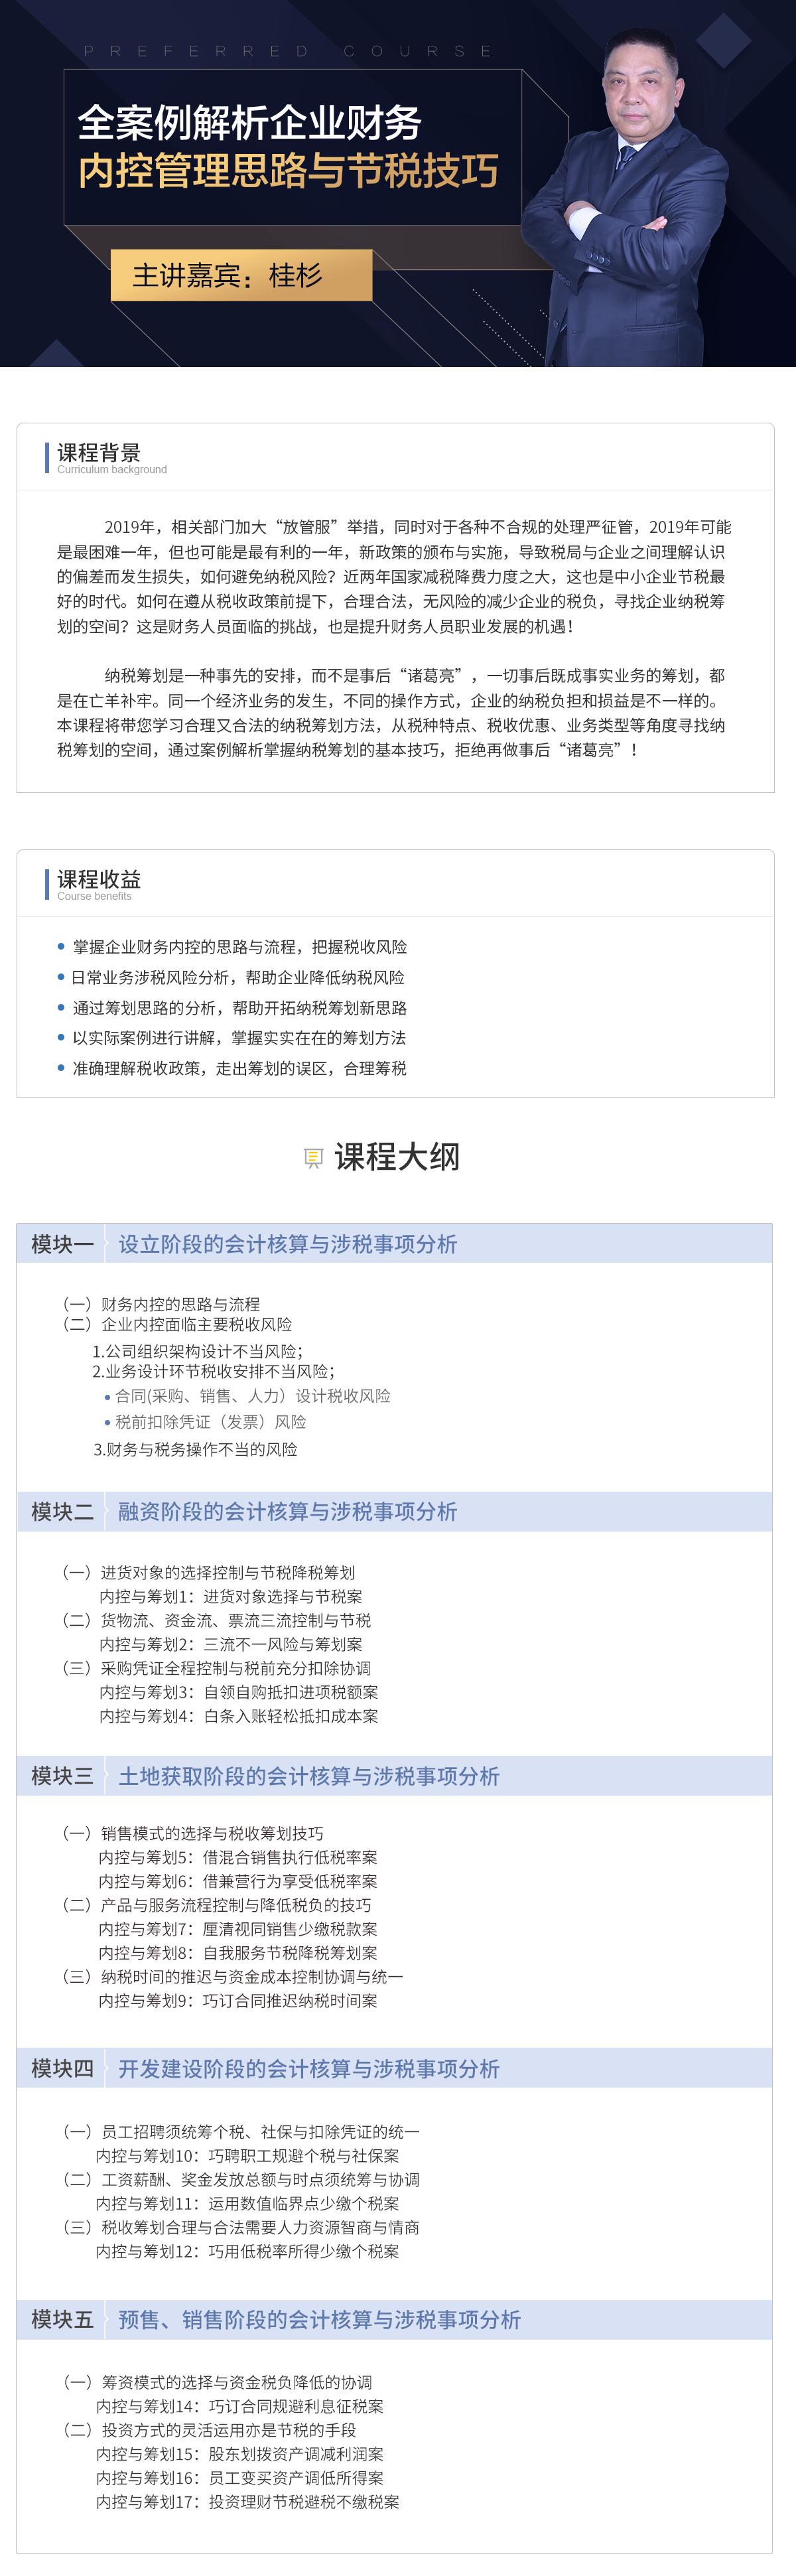 招生简章PC.png